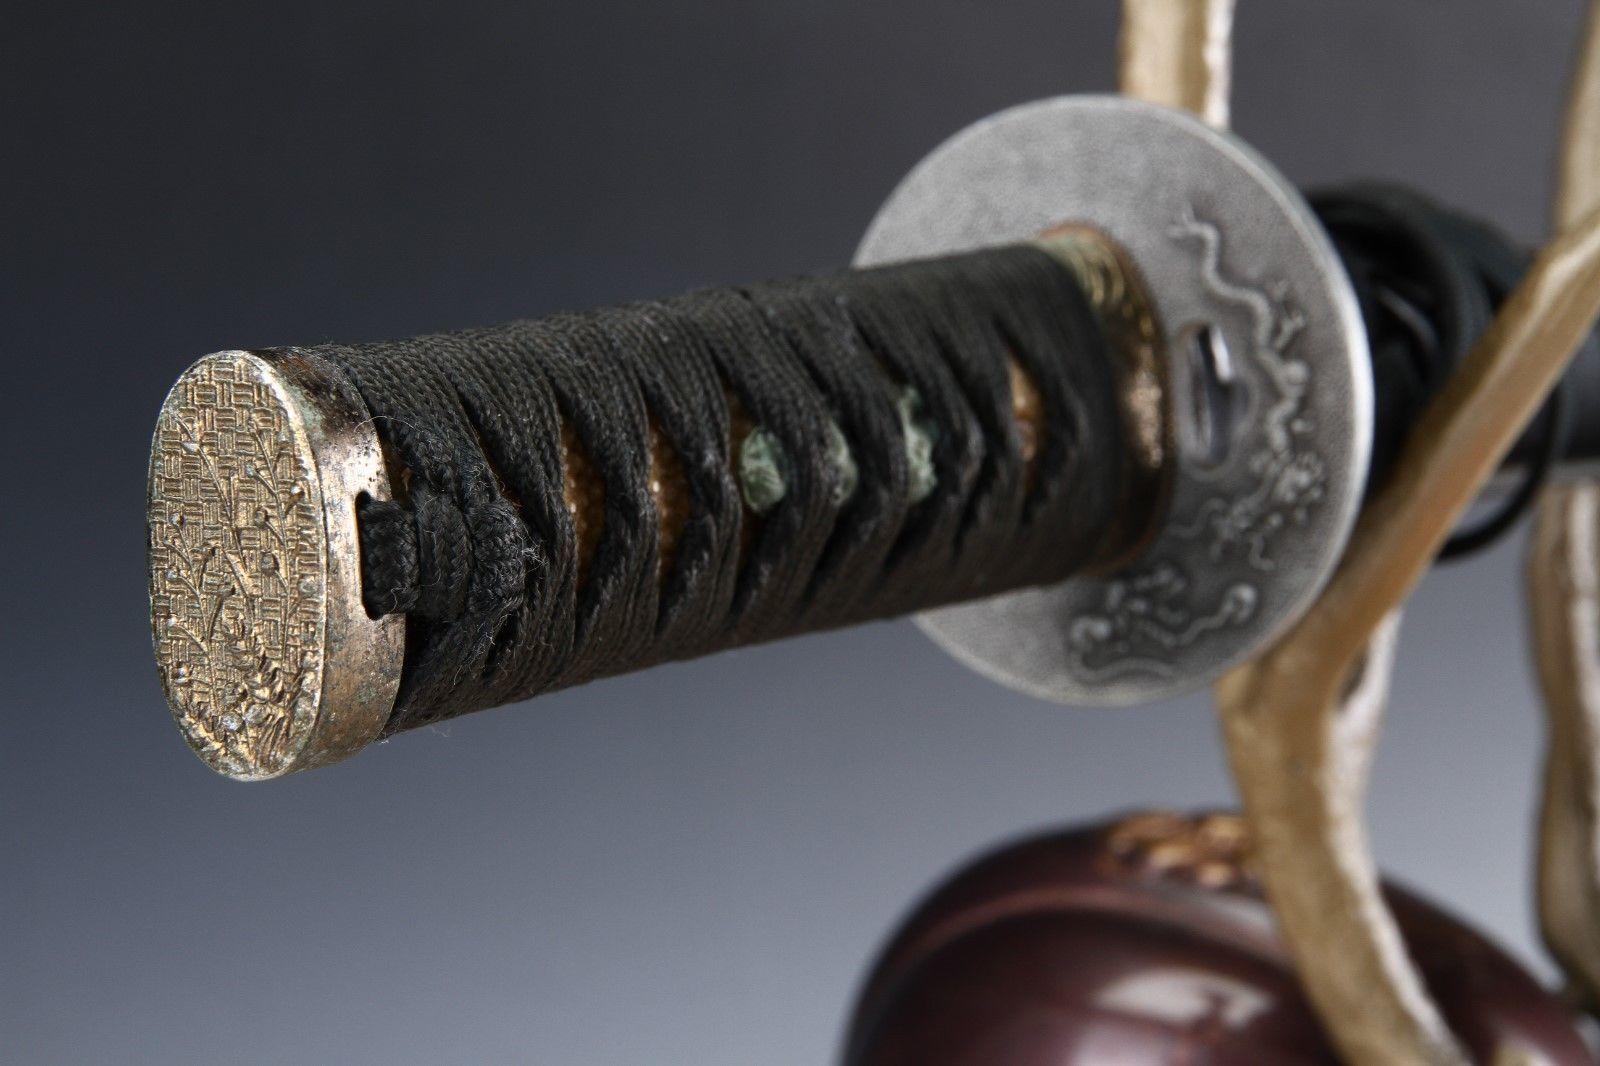 Japanese Beautiful Samurai Helmet -shikanosuke kabuto- with a Replica Blade image 8